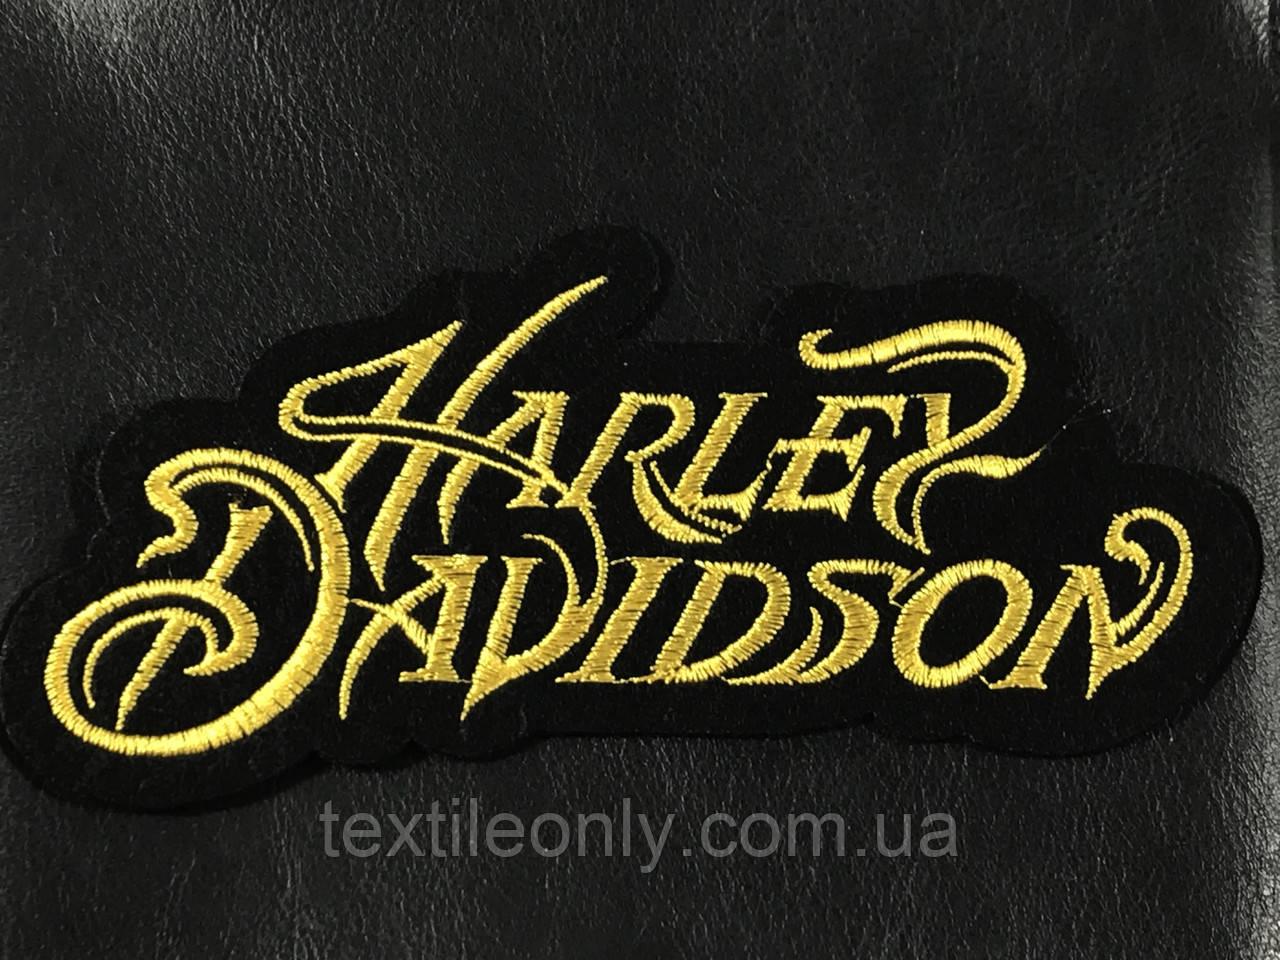 Нашивка Harley Davidson 160x80мм